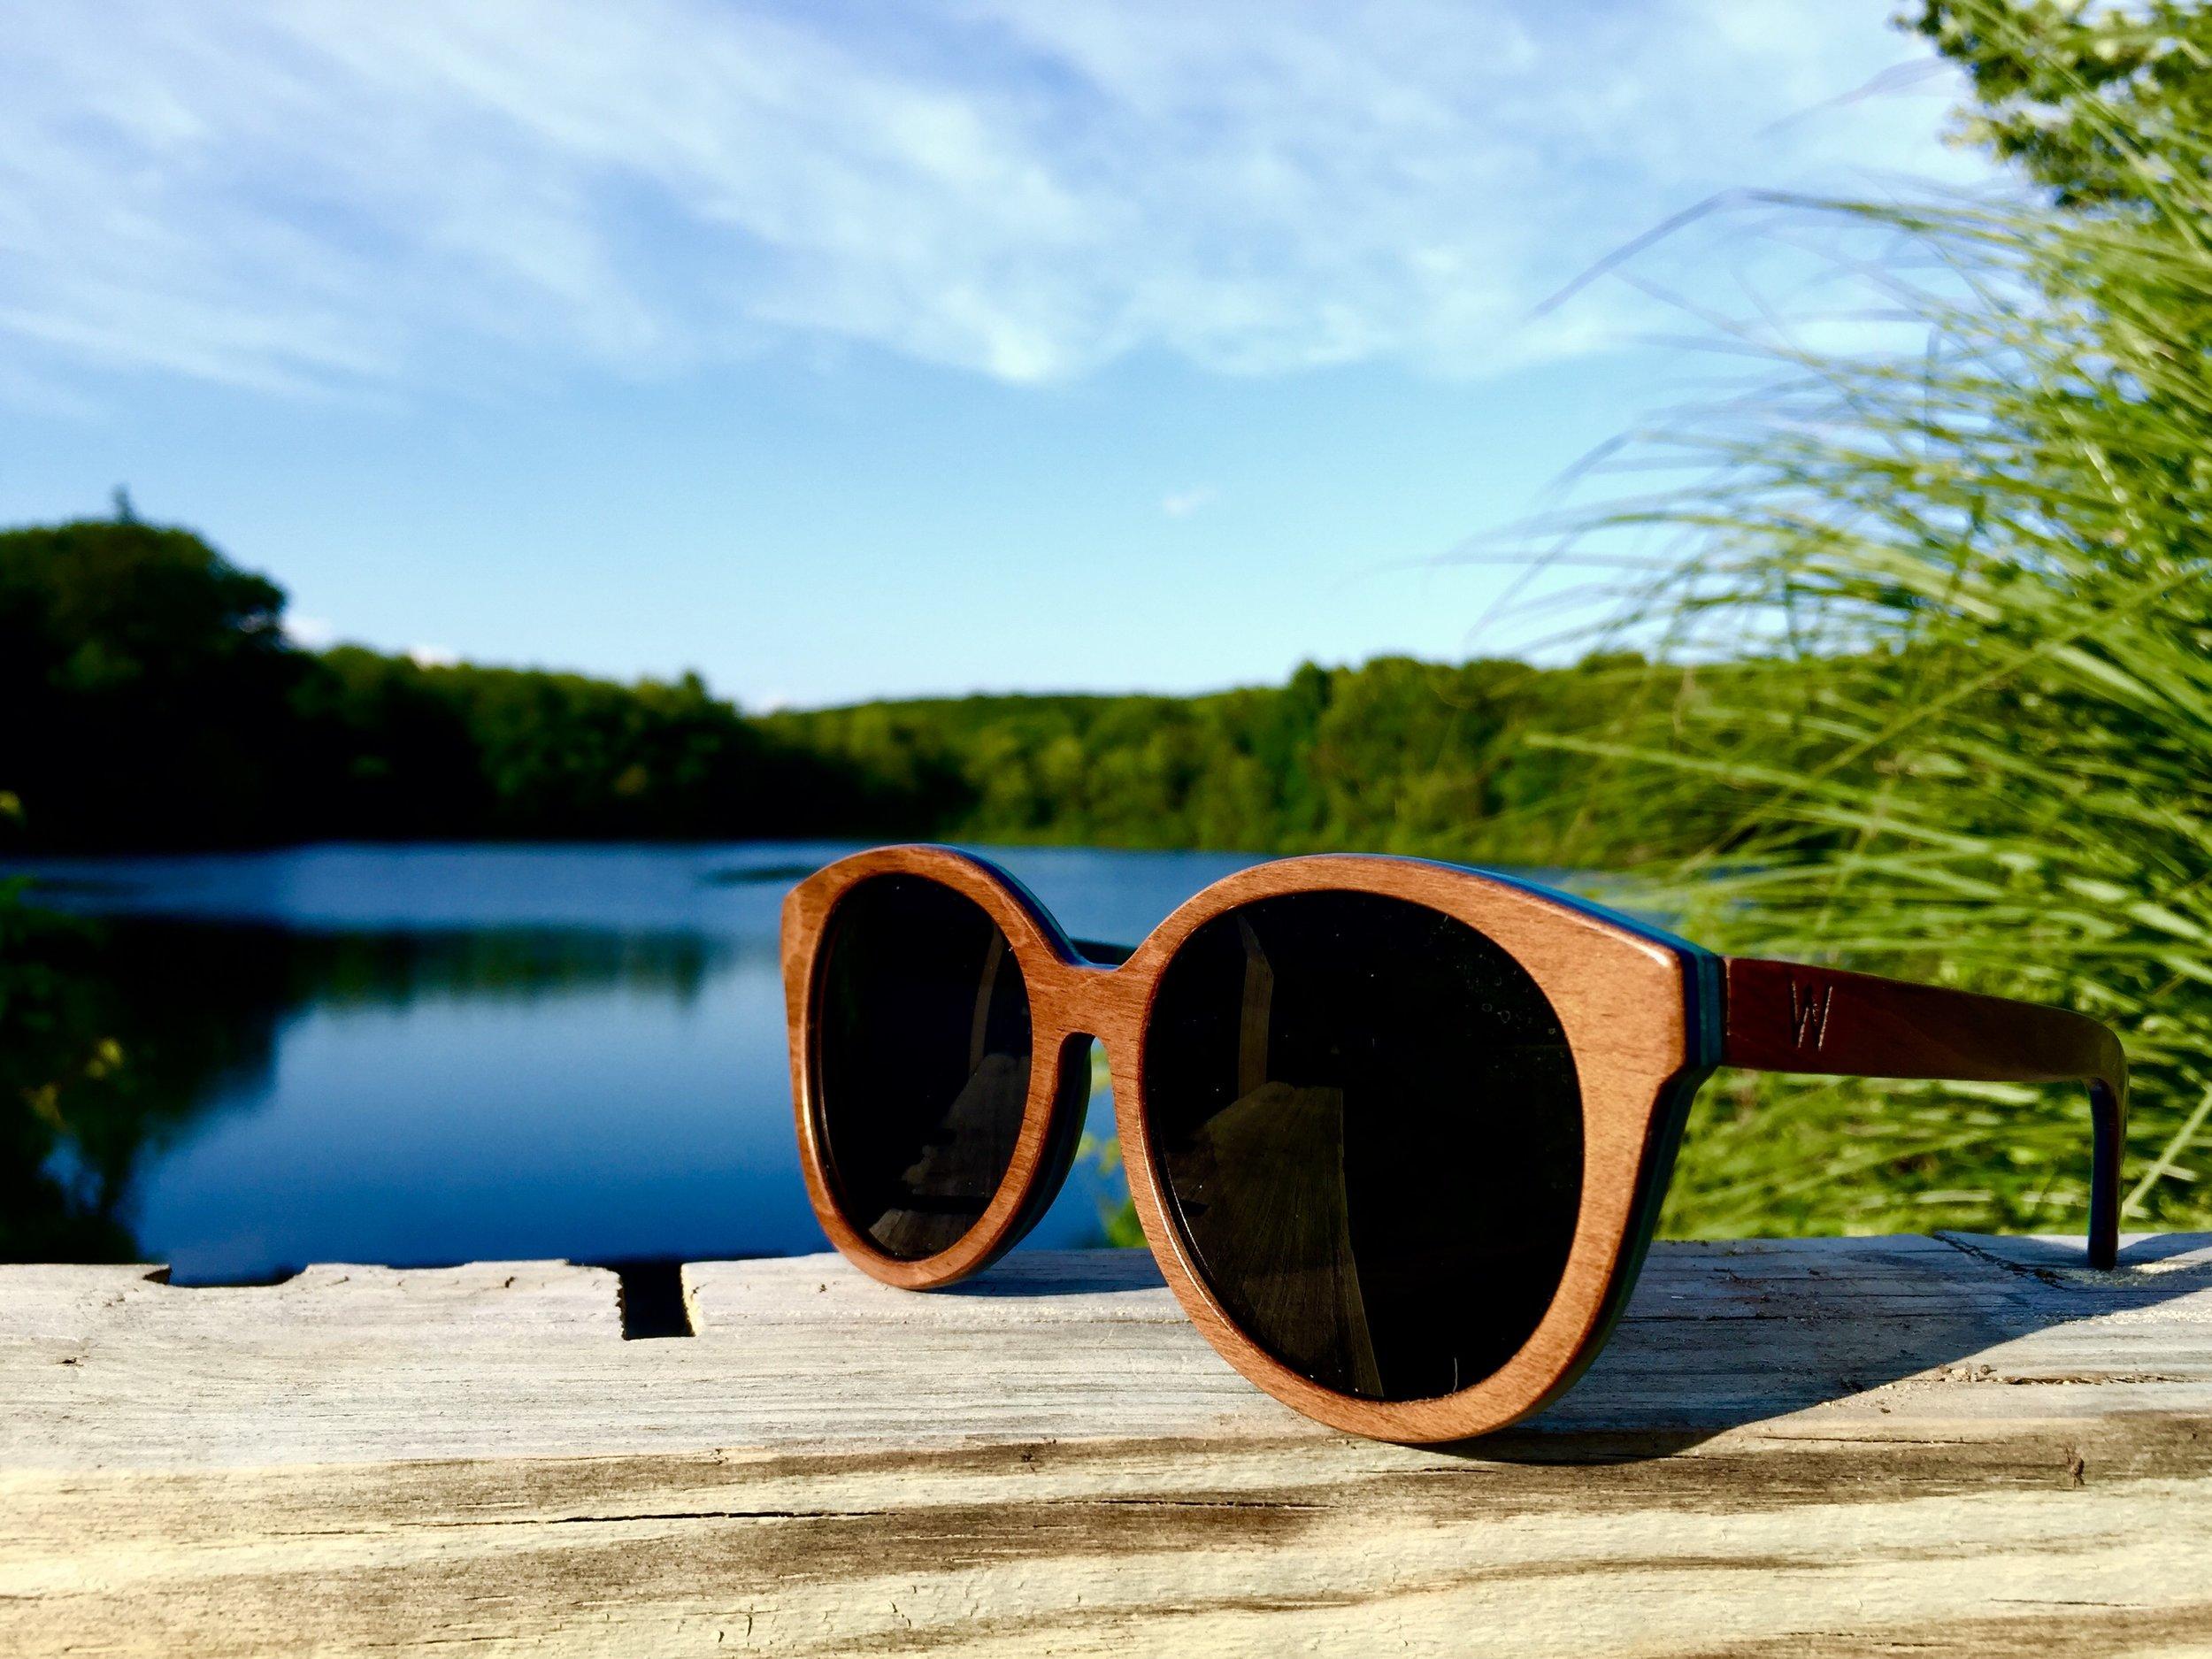 Woodzee sunglasses made from repurposed skateboards